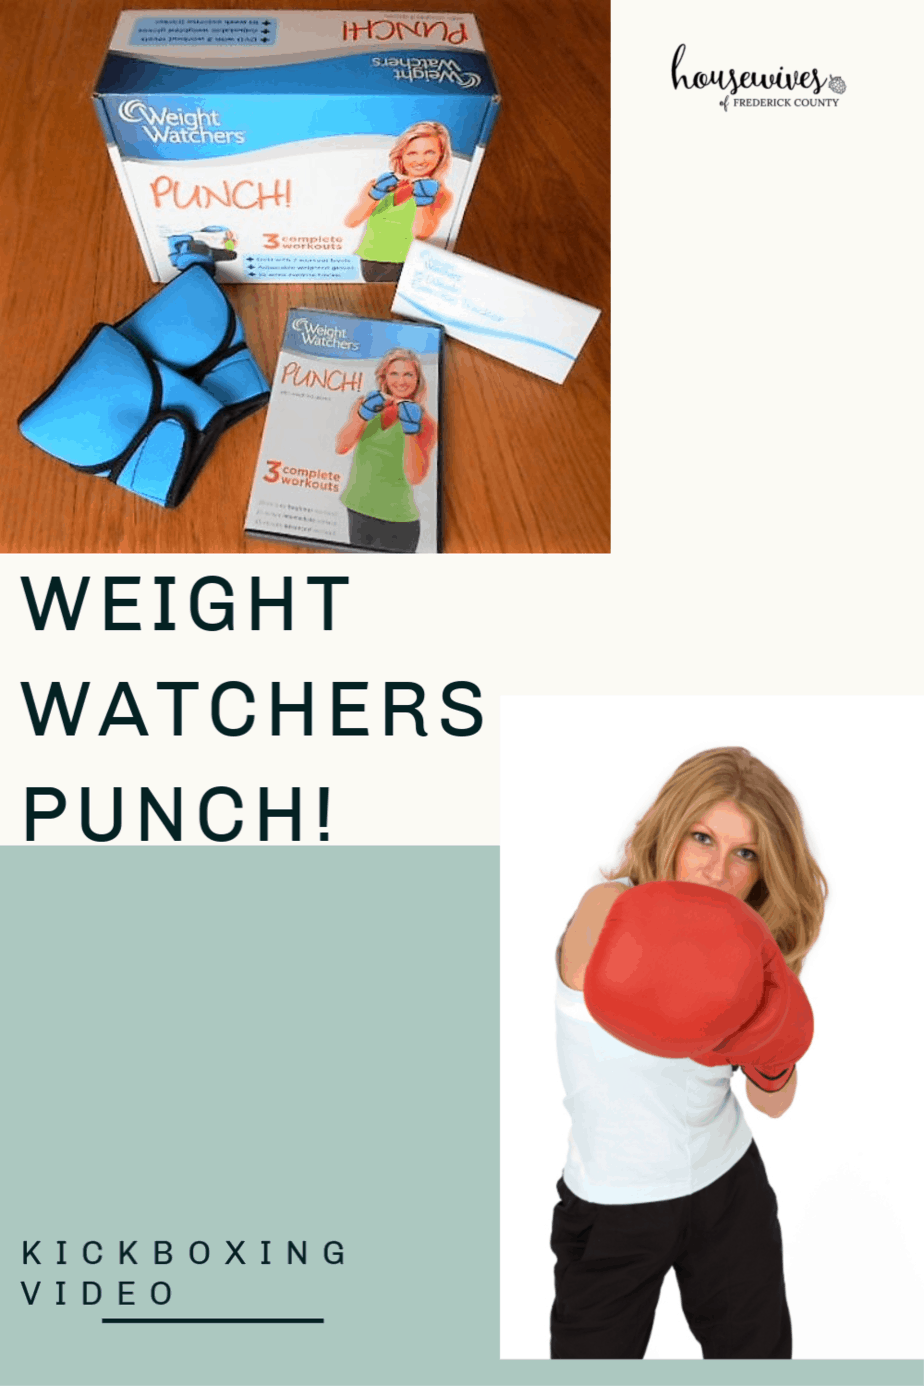 Weight Watchers PUNCH! Kickboxing Video